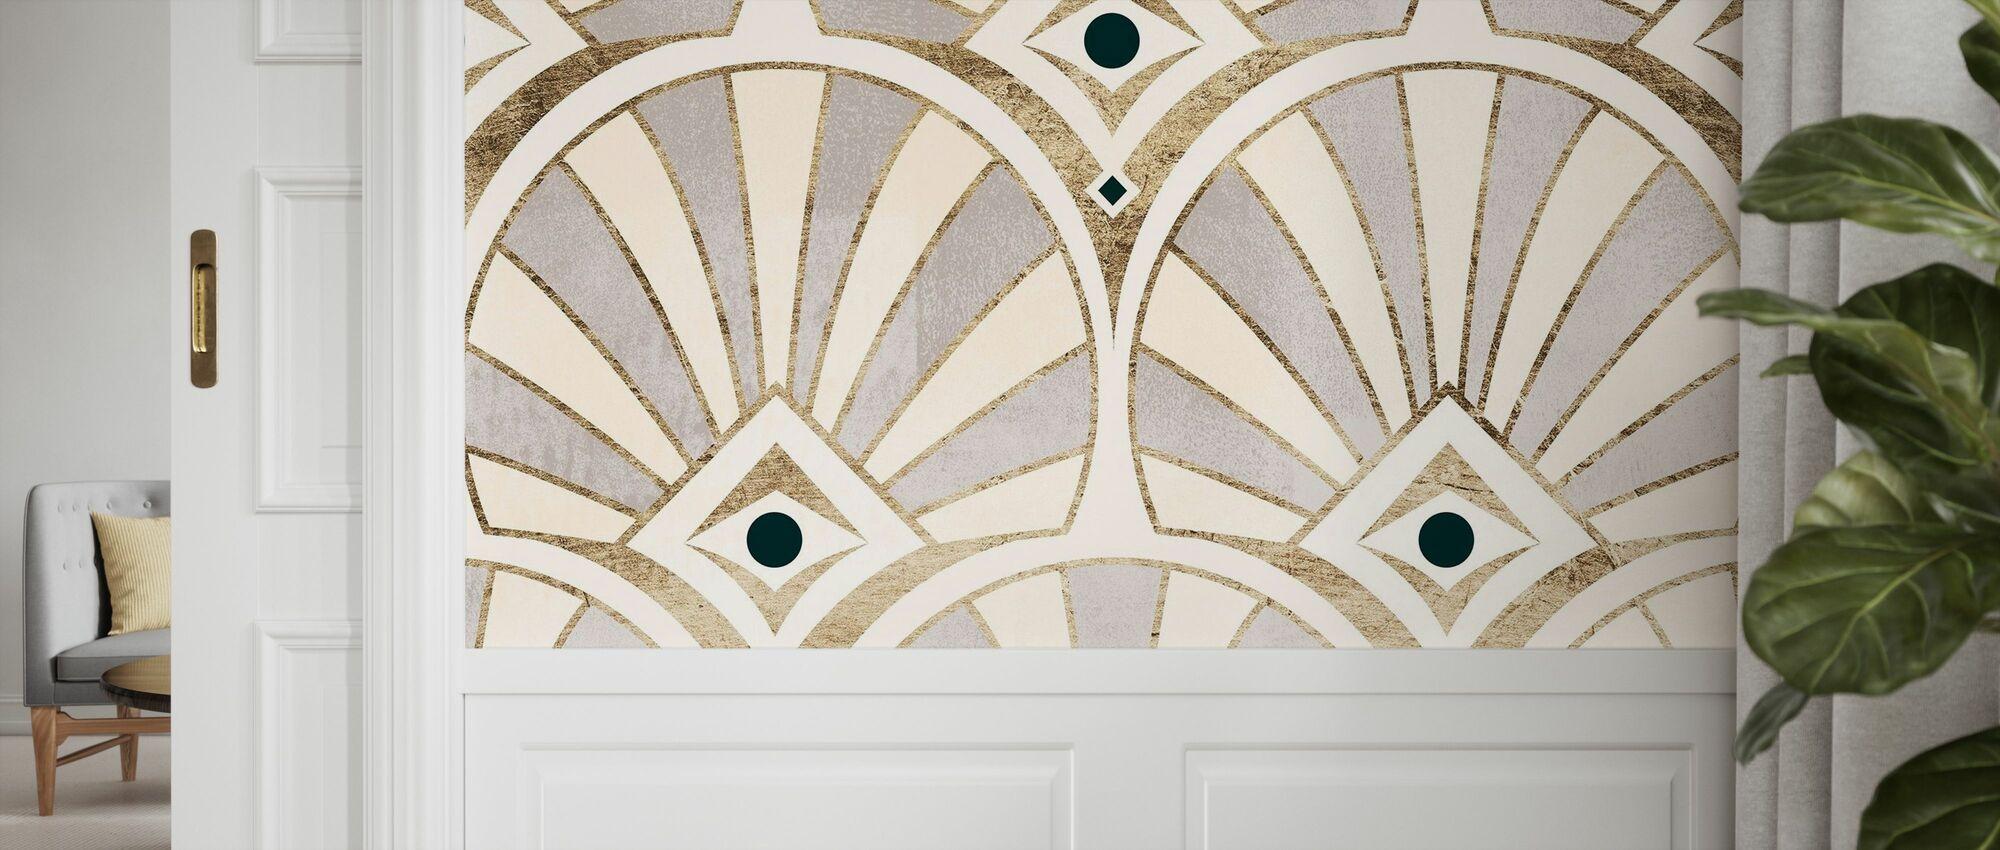 Deco Patterning I - Wallpaper - Hallway